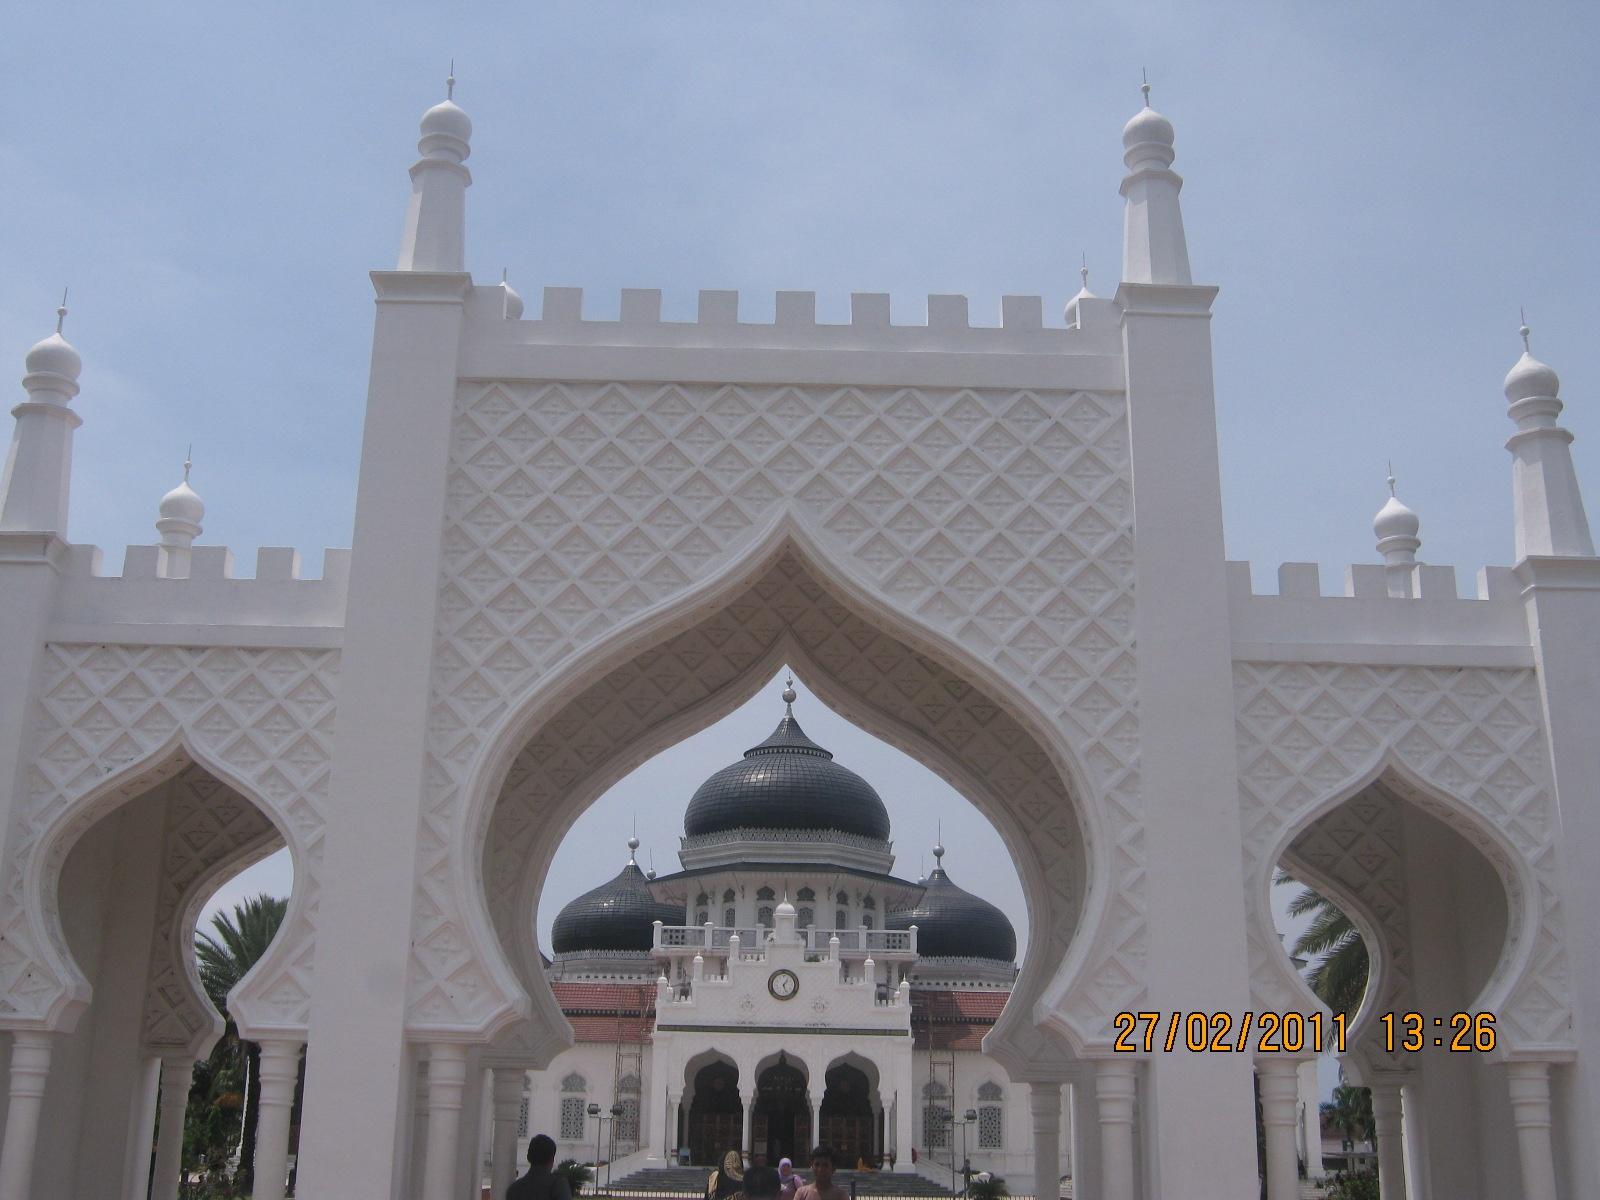 Baiturrahman, Great Mosque of Aceh, Indonesia by Khairun Amala